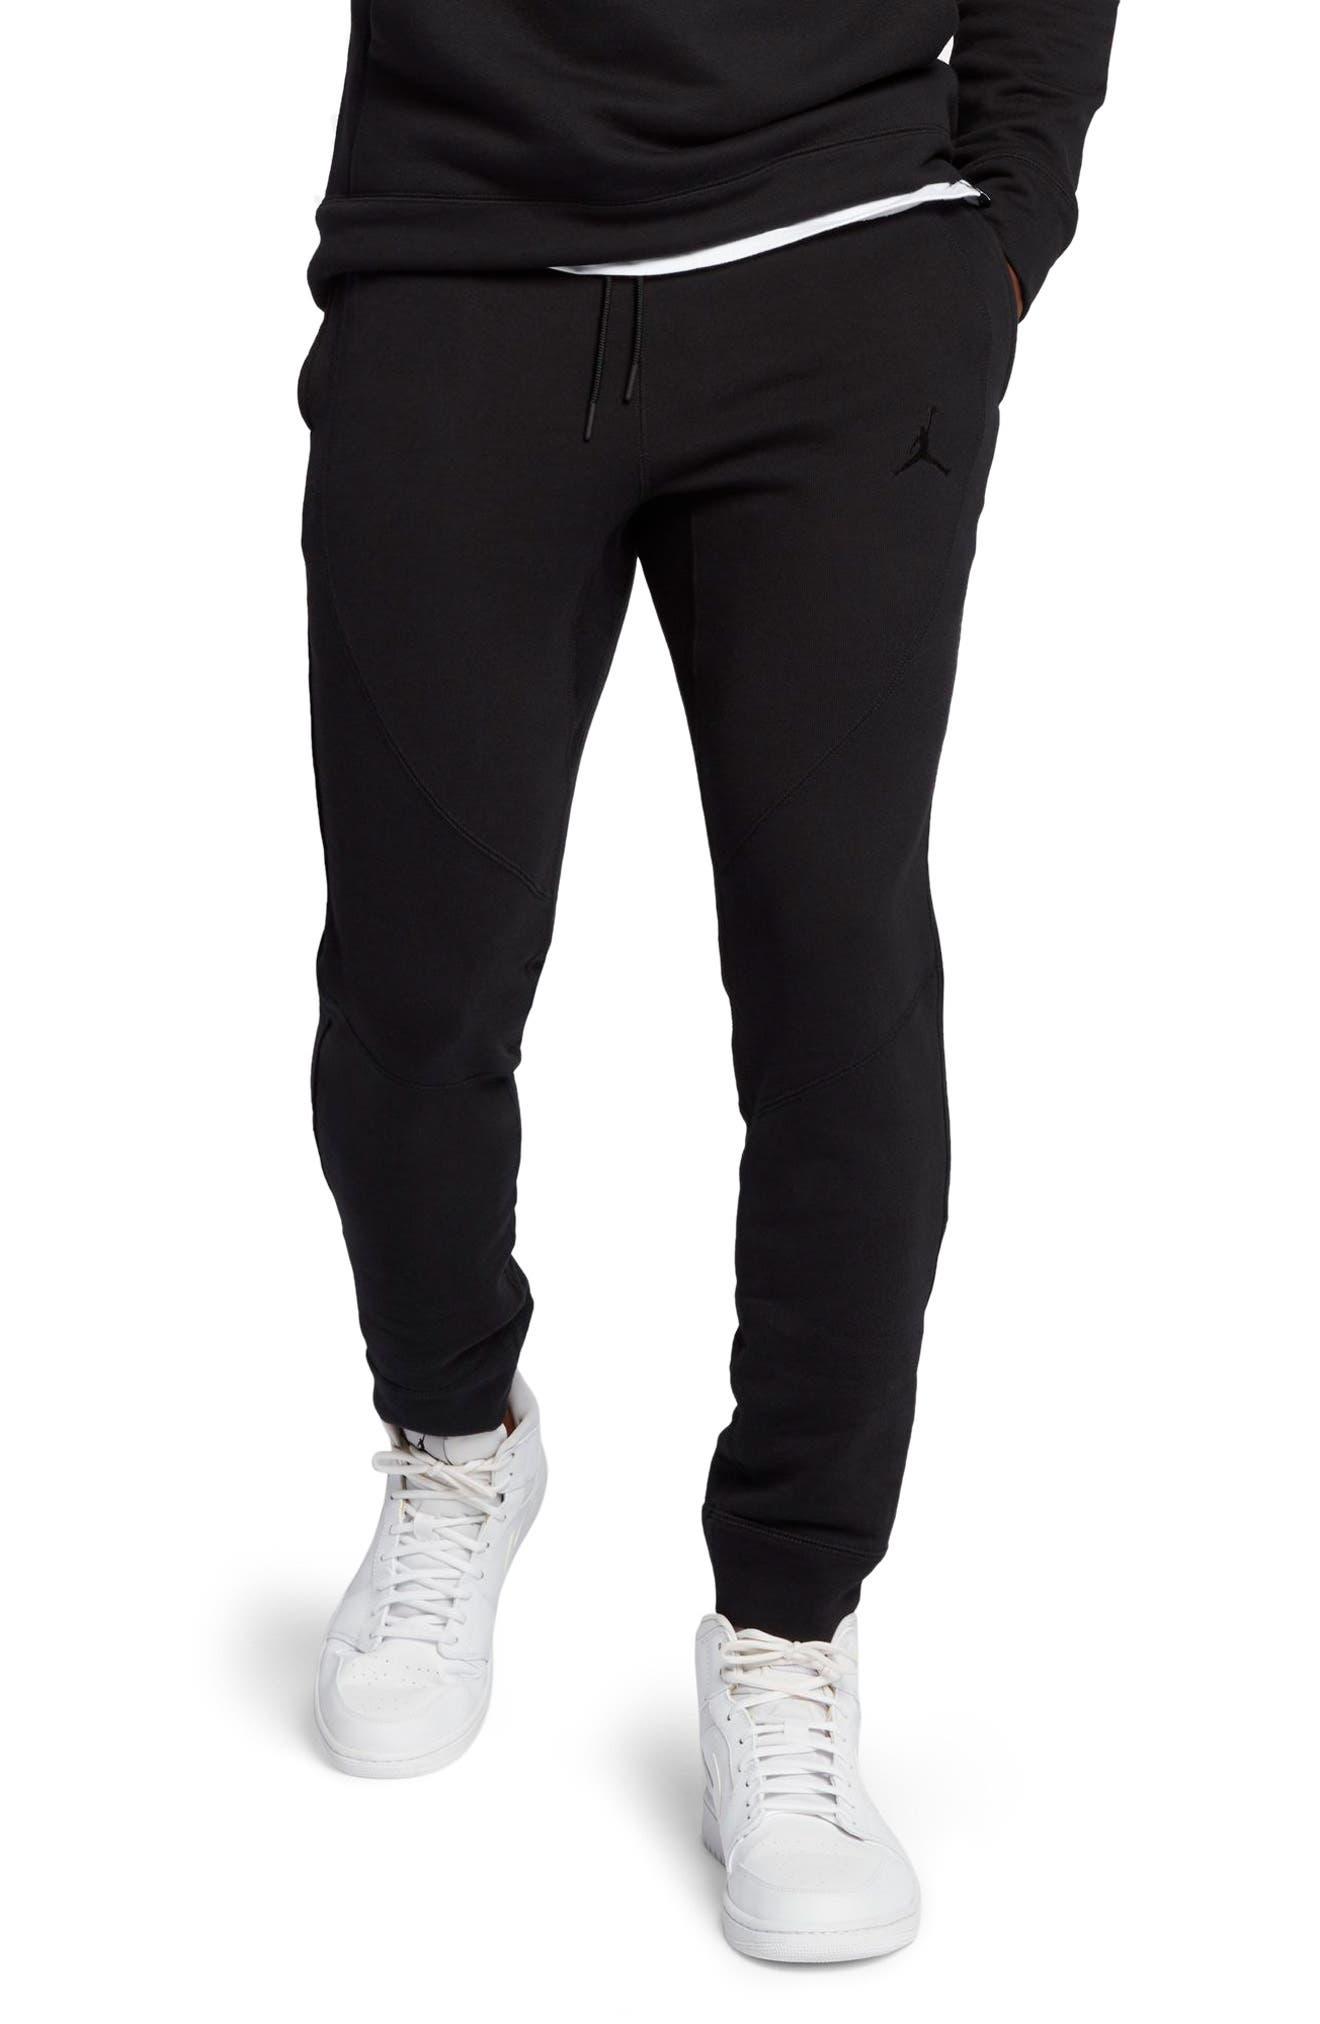 JORDAN, Wings Fleece Pants, Main thumbnail 1, color, BLACK/ BLACK